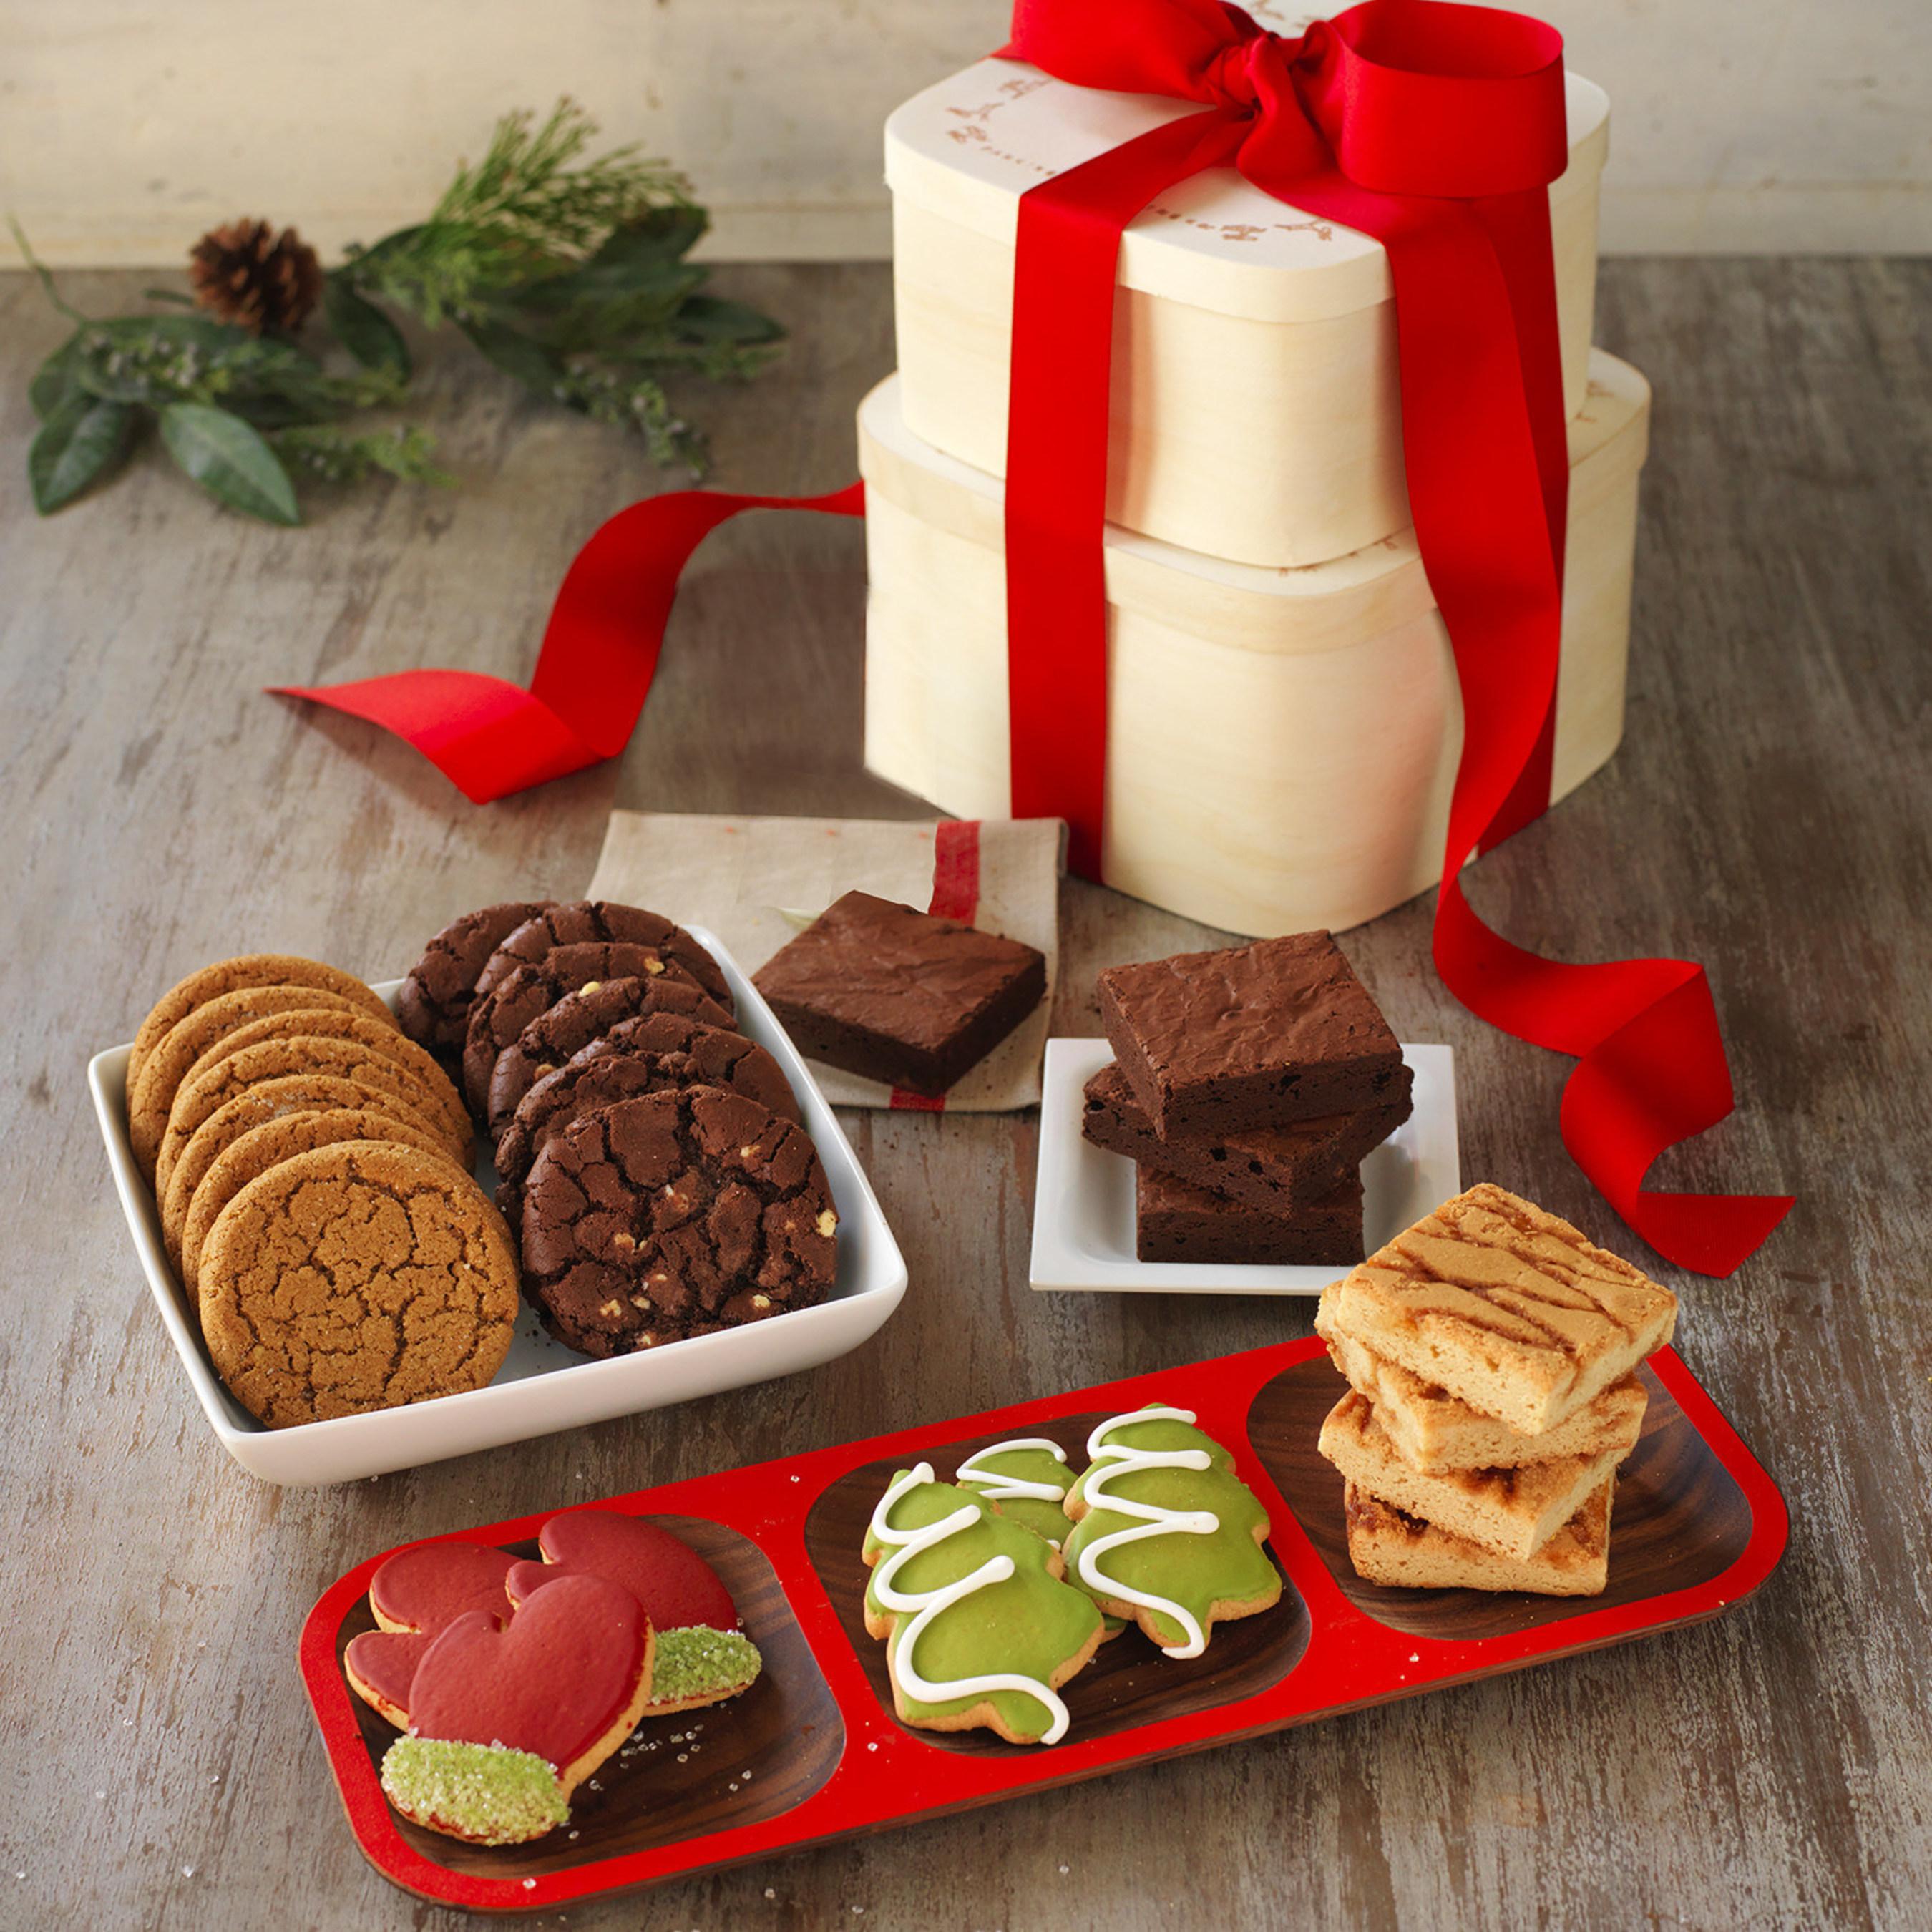 Baked Christmas Gifts: Dancing Deer Baking Company Helps Make Holiday Shopping